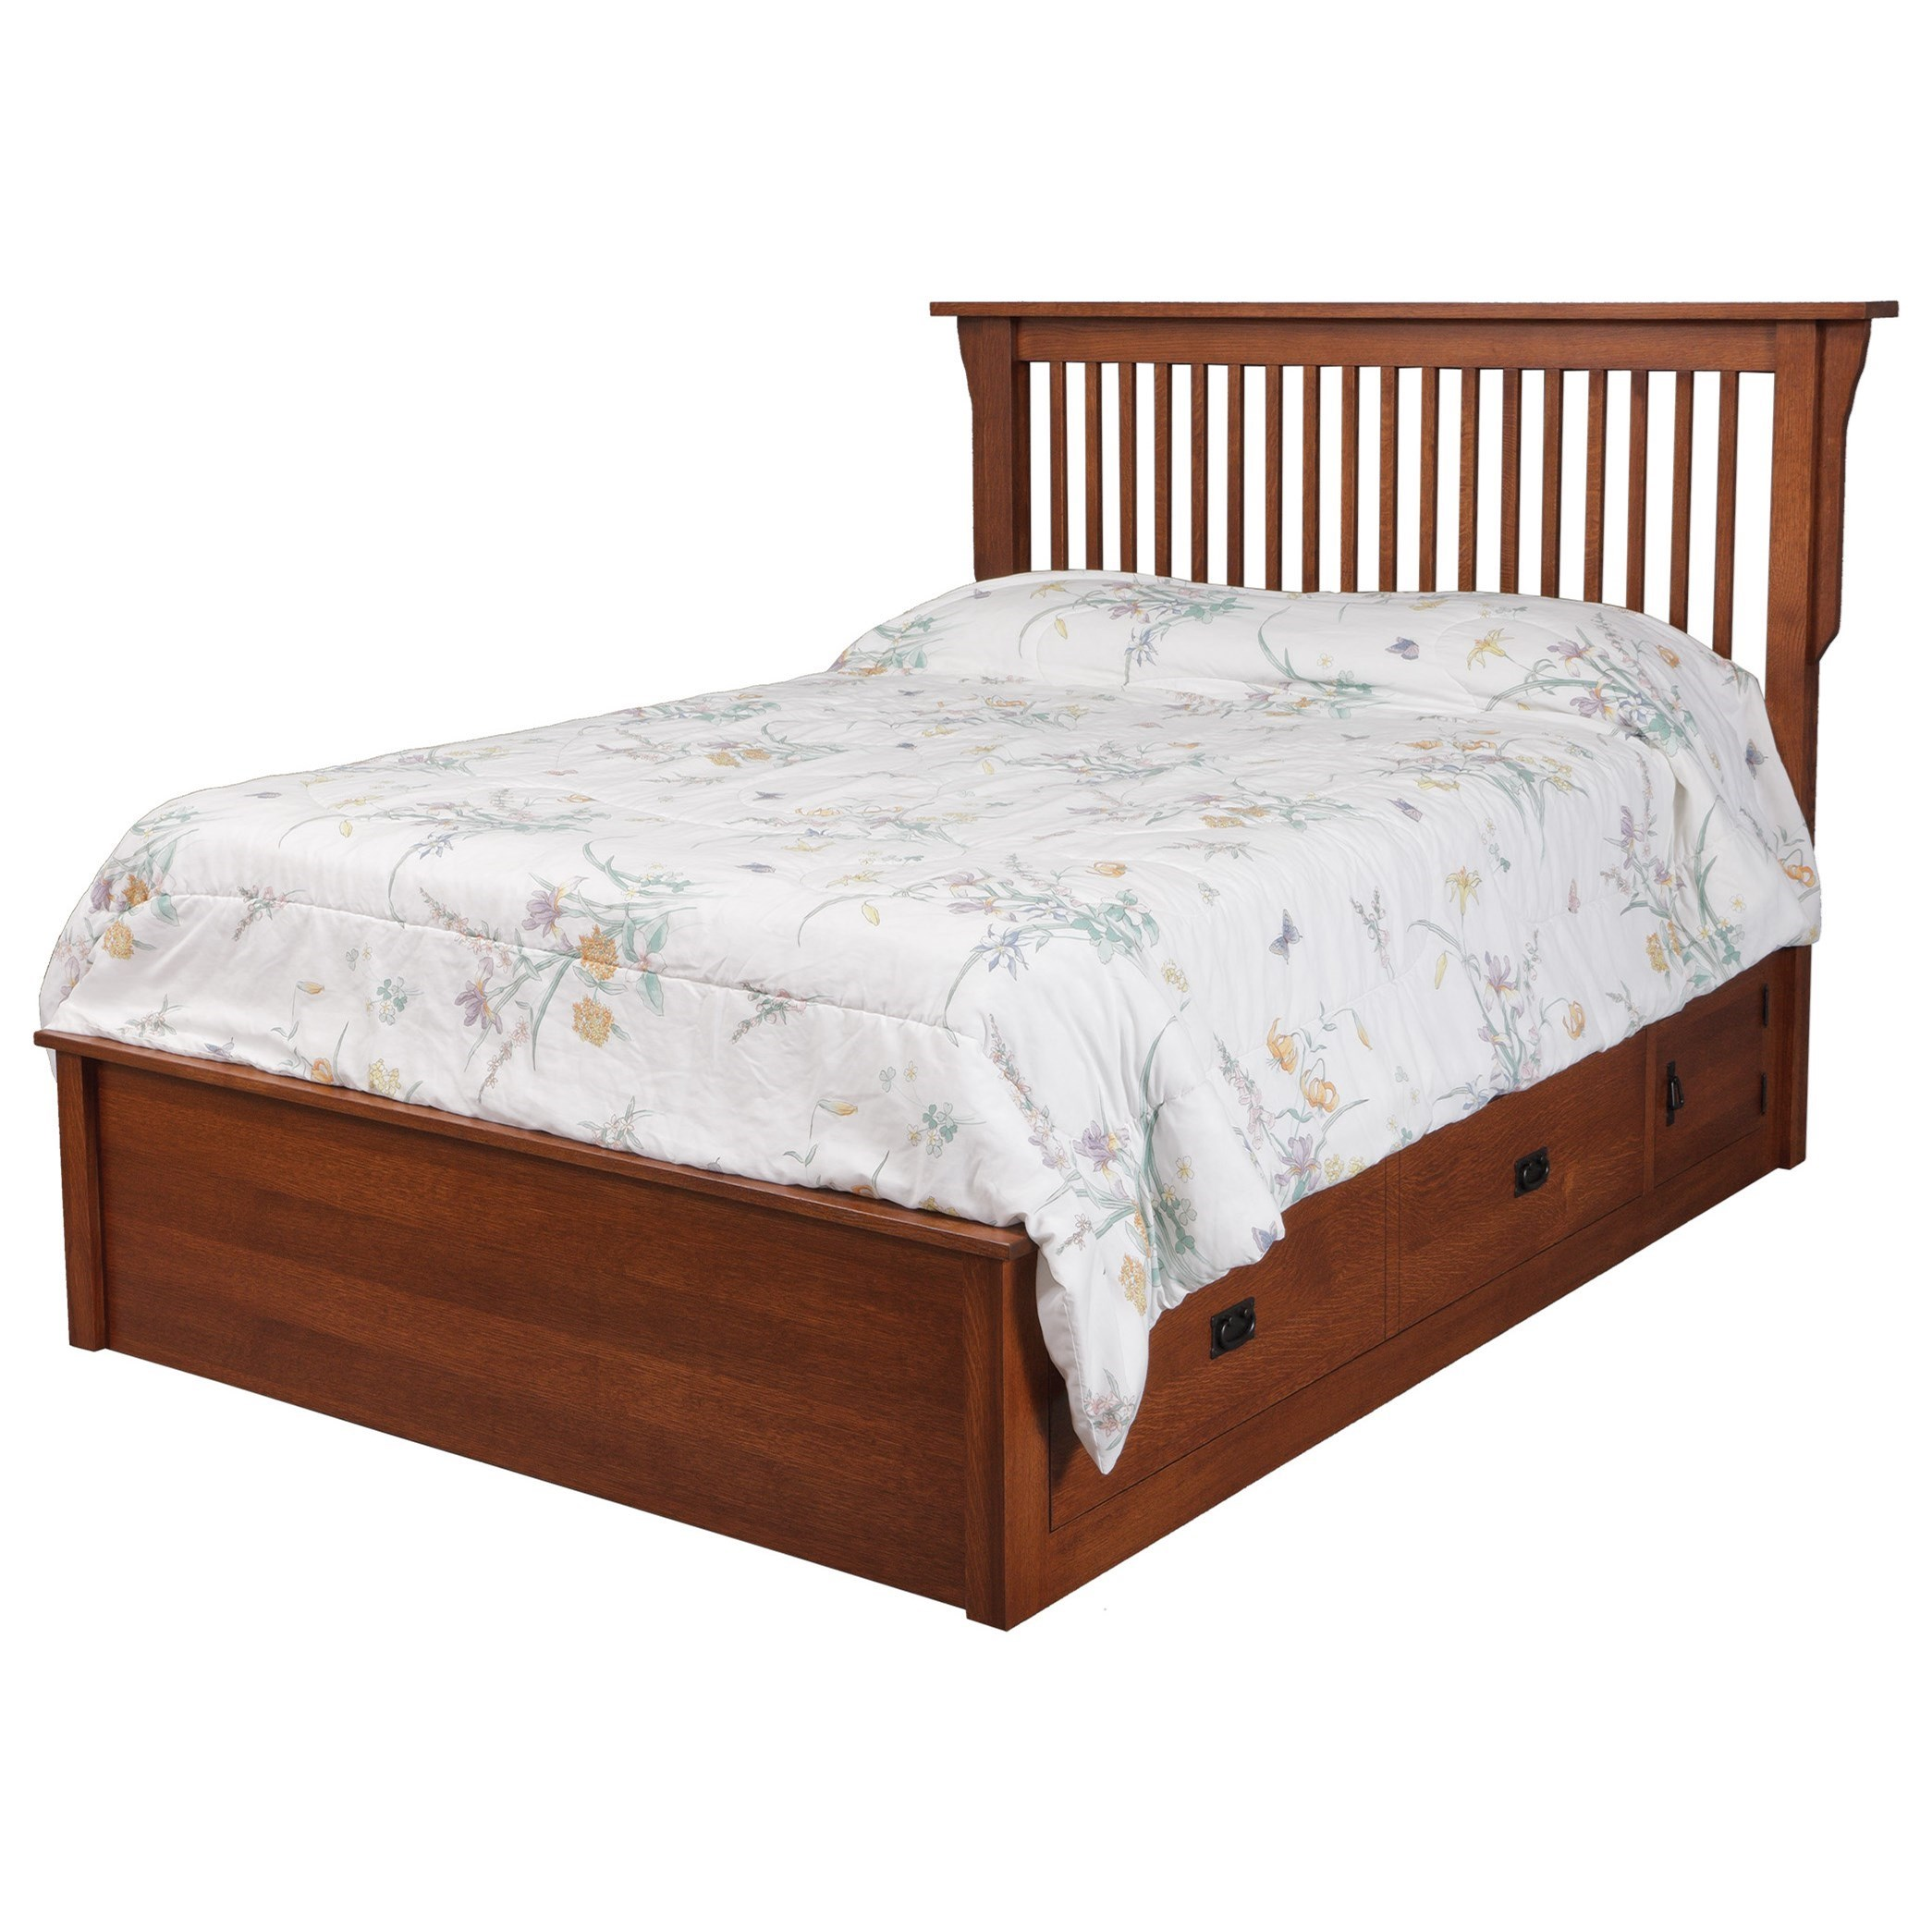 Mission King Pedestal Bed W/ Storage Drawer by Daniel's Amish at Lapeer Furniture & Mattress Center